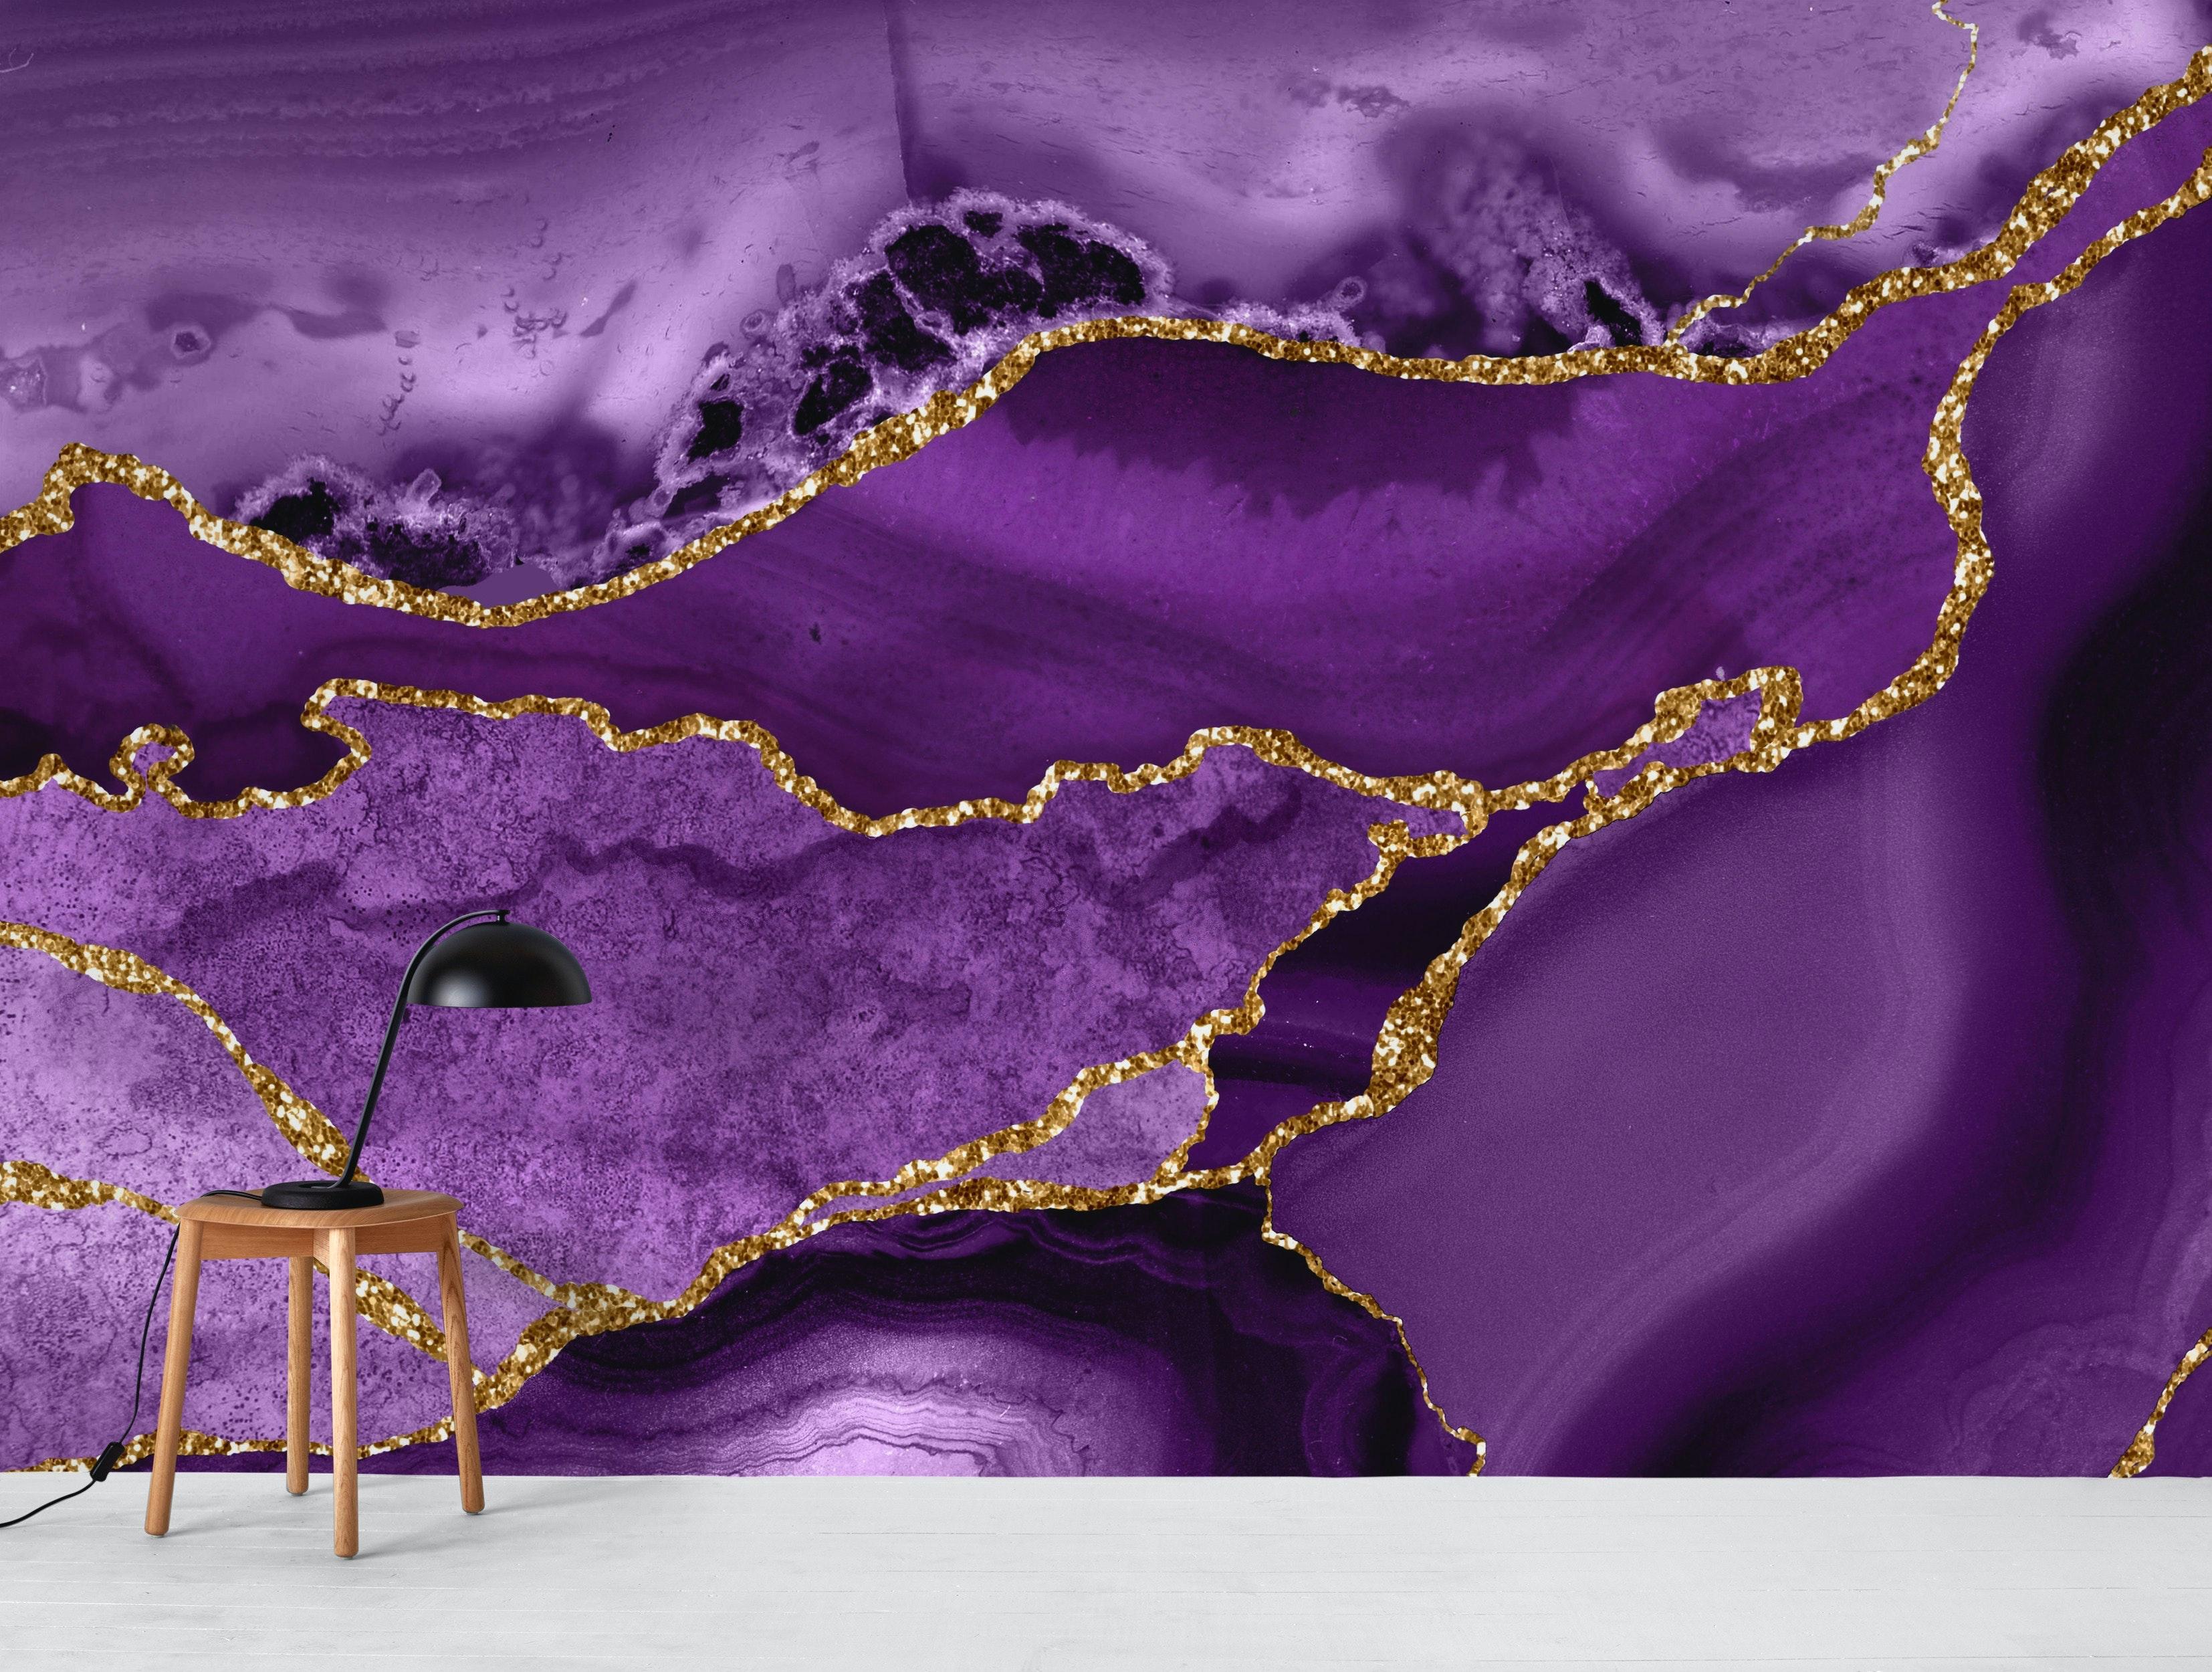 Buy Purple Gold Marble Mosaic Wallpaper Free Us Shipping At Happywall Com